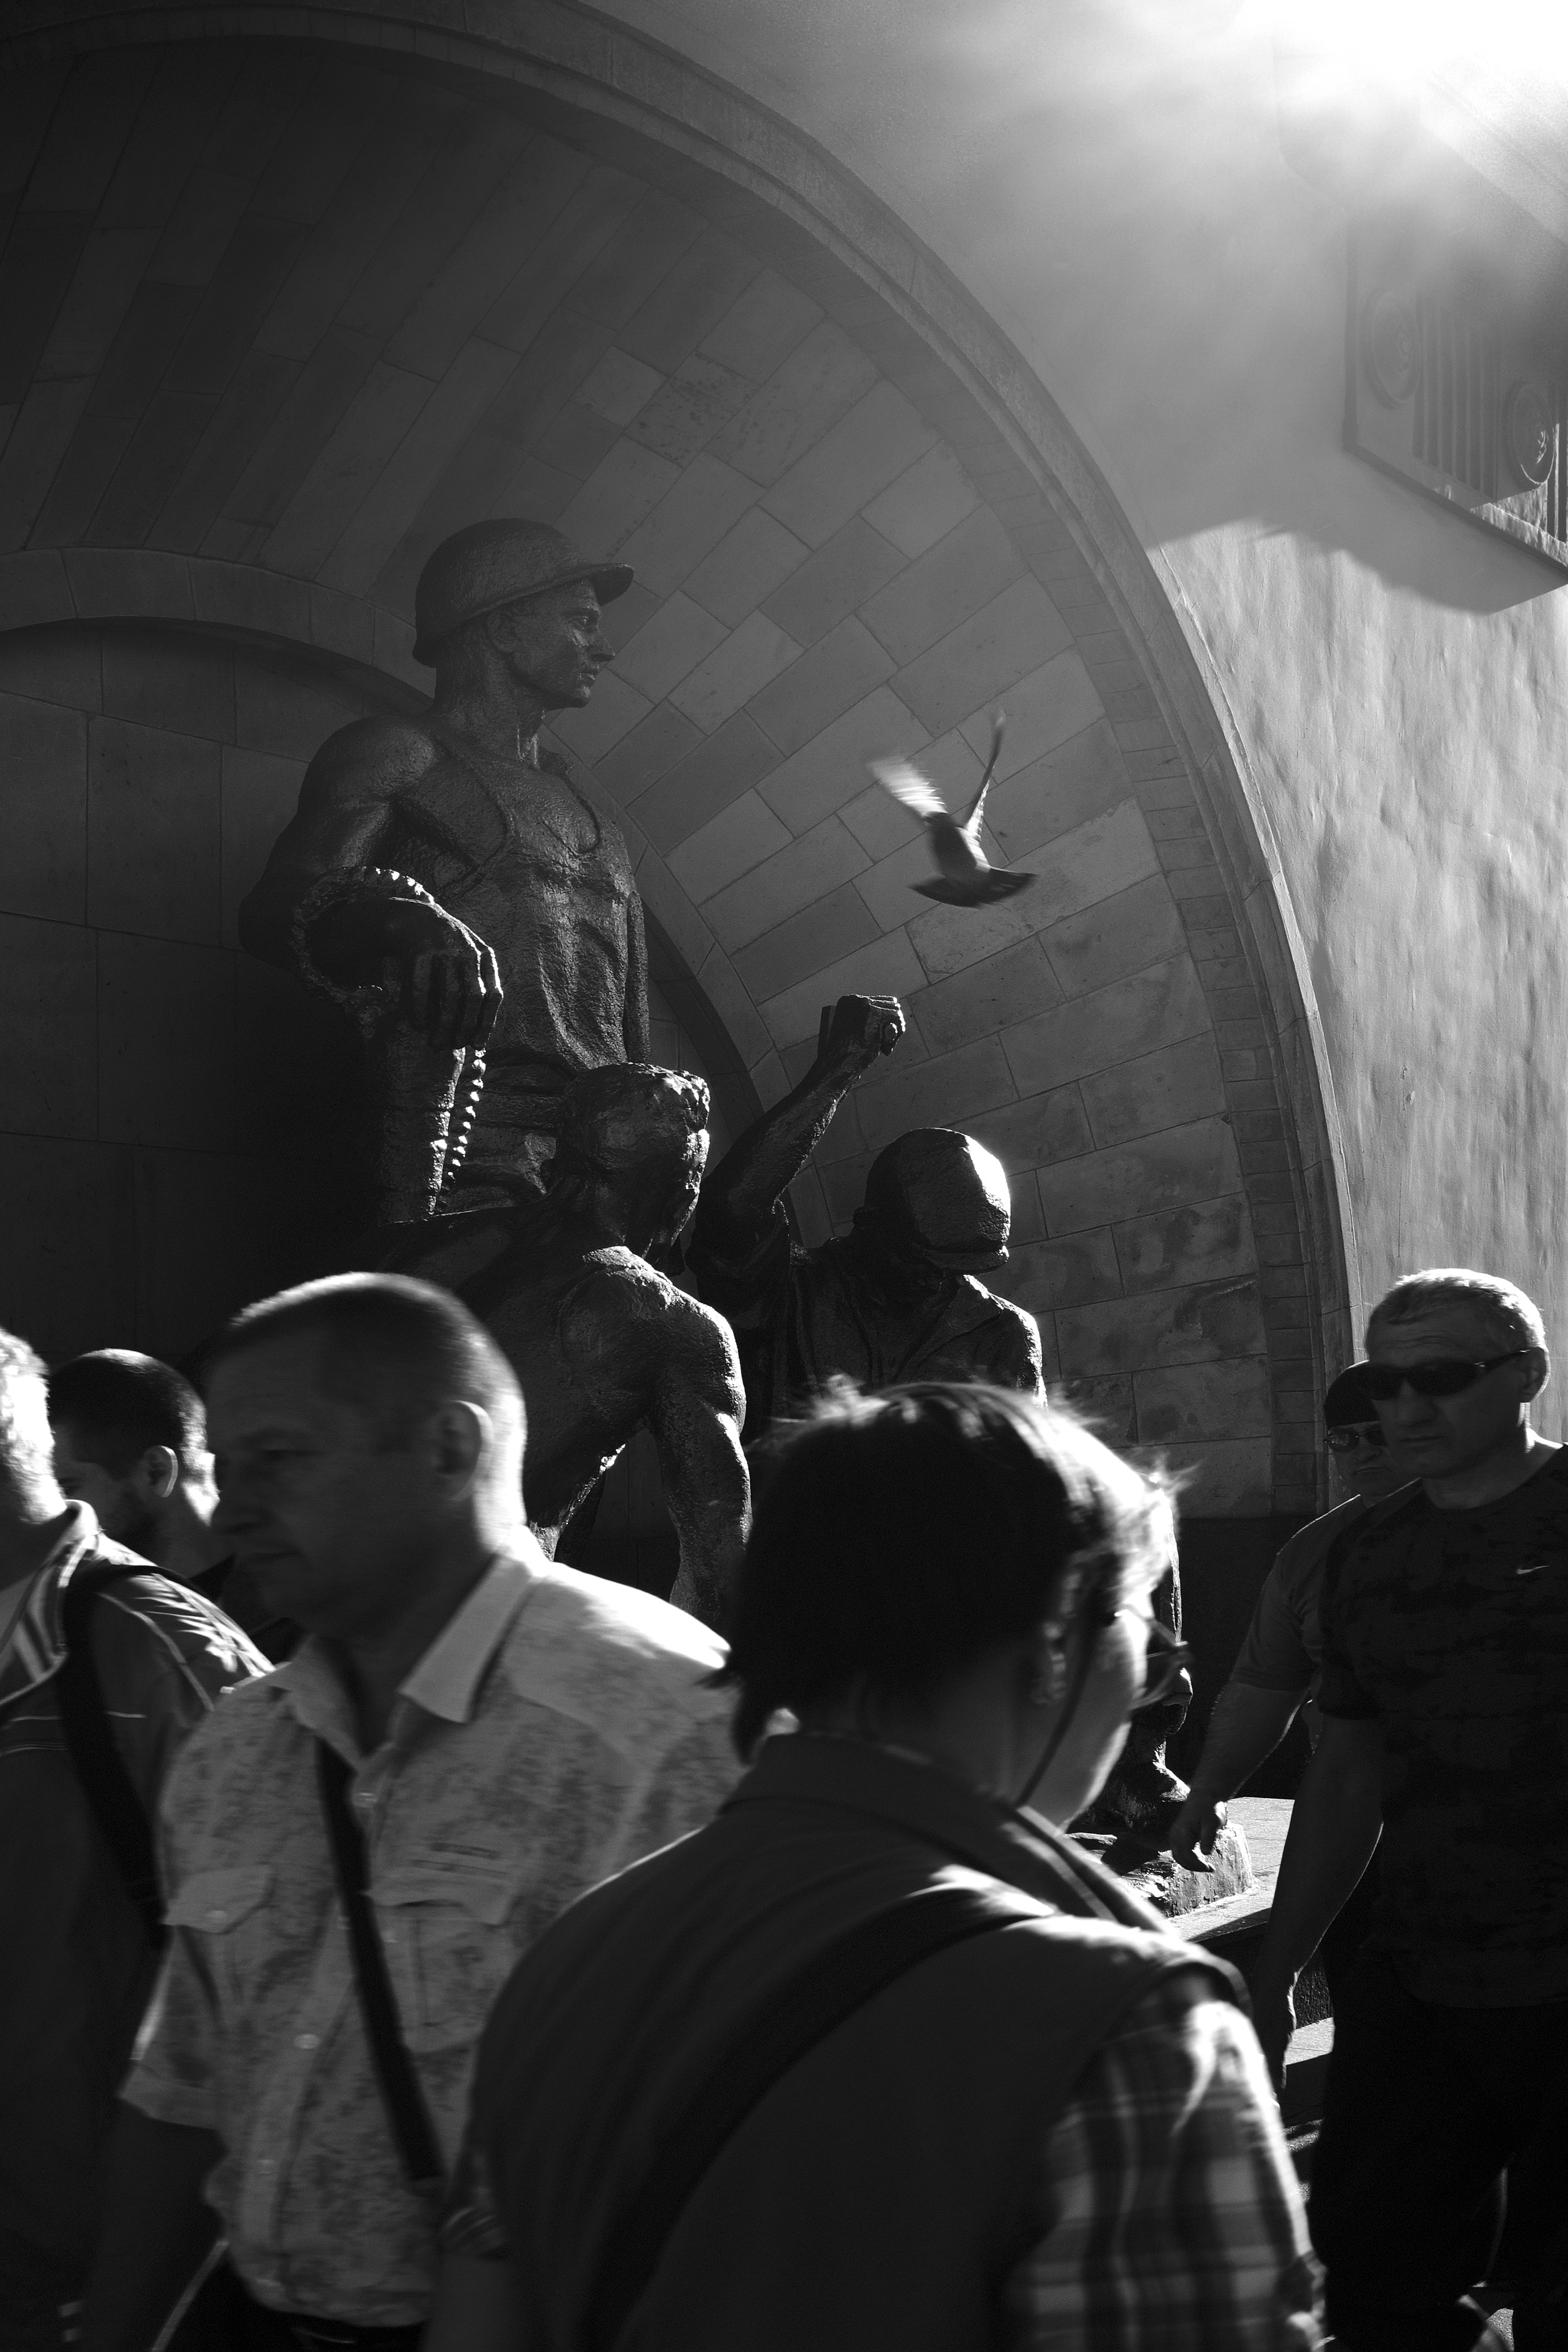 «Москва в деталях» Артемия Ломова